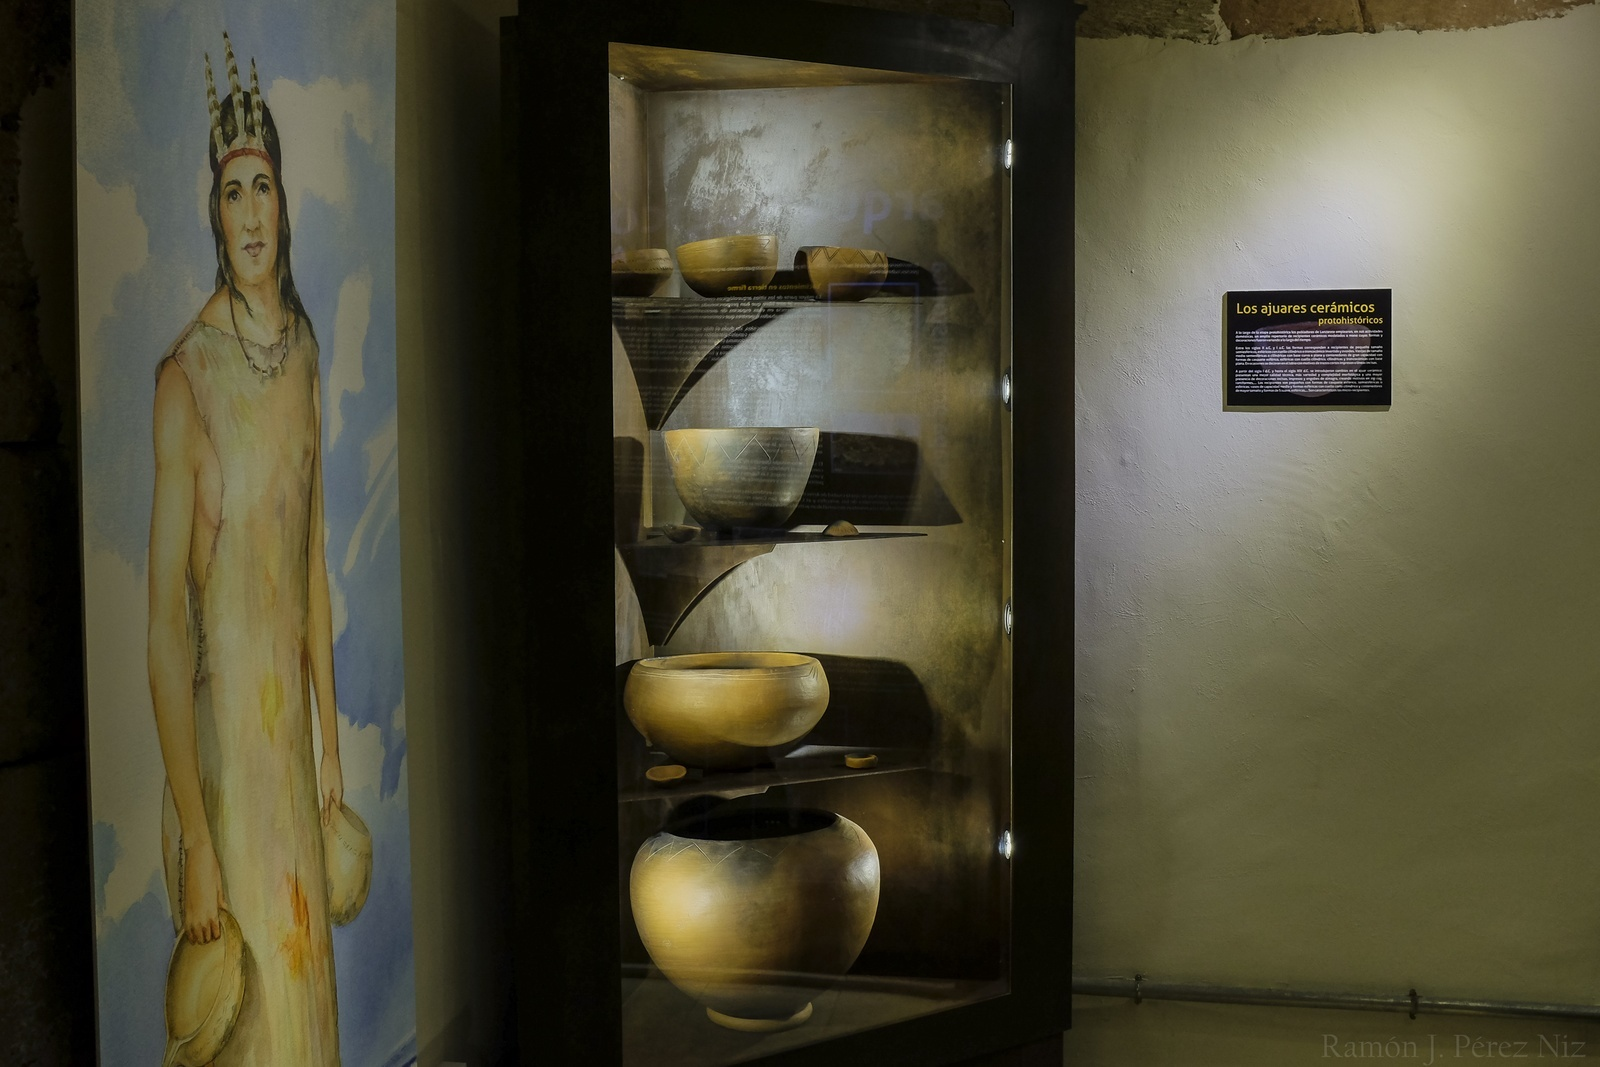 Museo de Historia de Arrecife